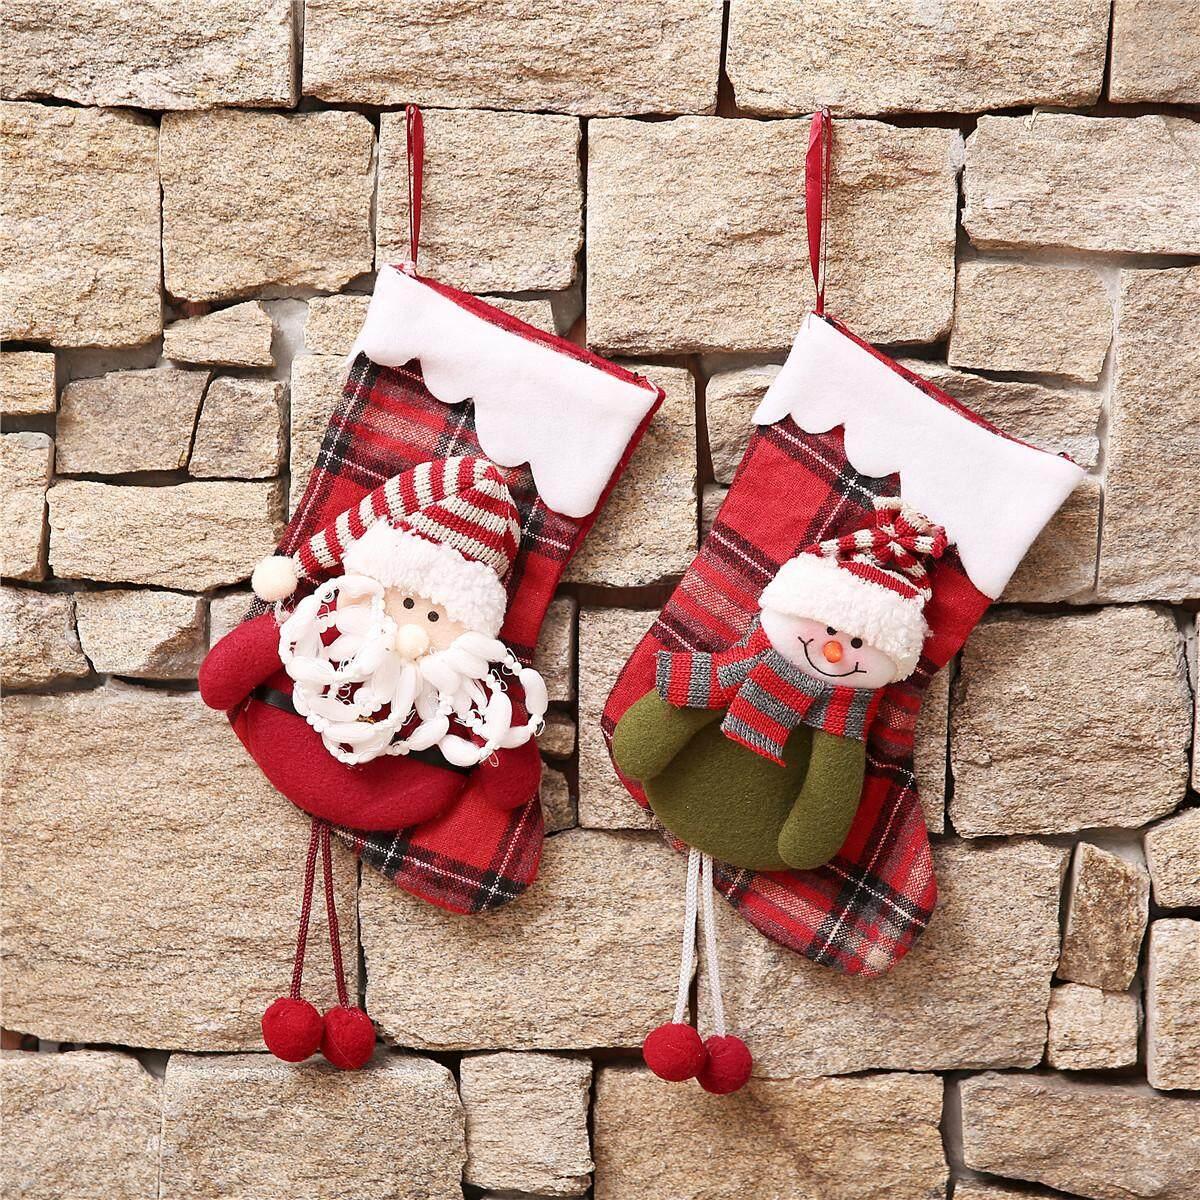 OPP Bag Packaging Santa Claus Snowman Christmas Stocking Material Elderly - intl